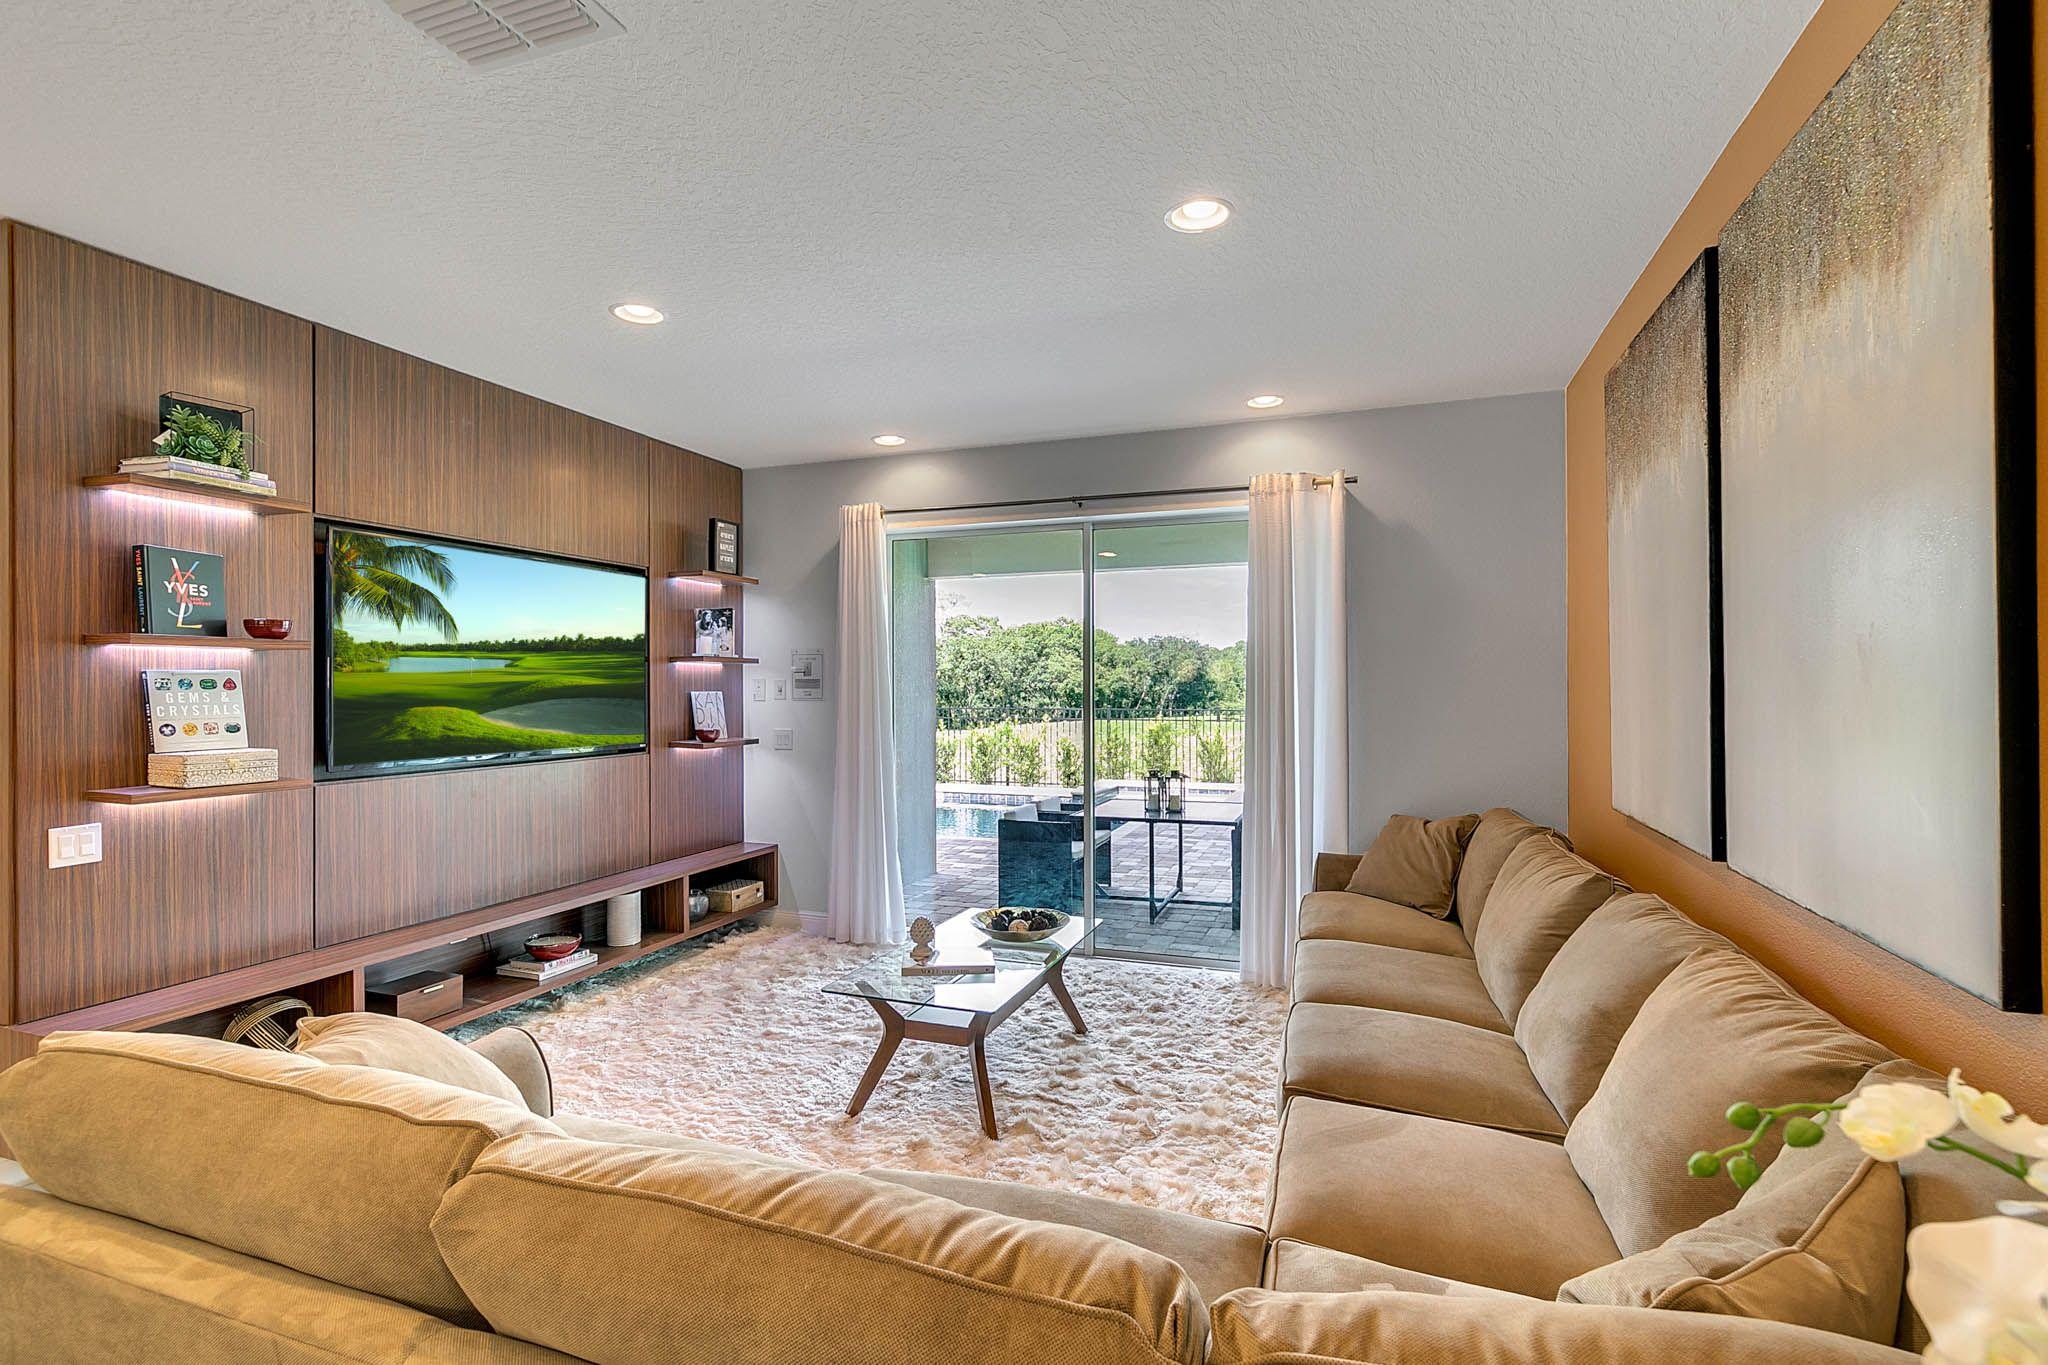 Arq design usa vacation home living room wood panel beige